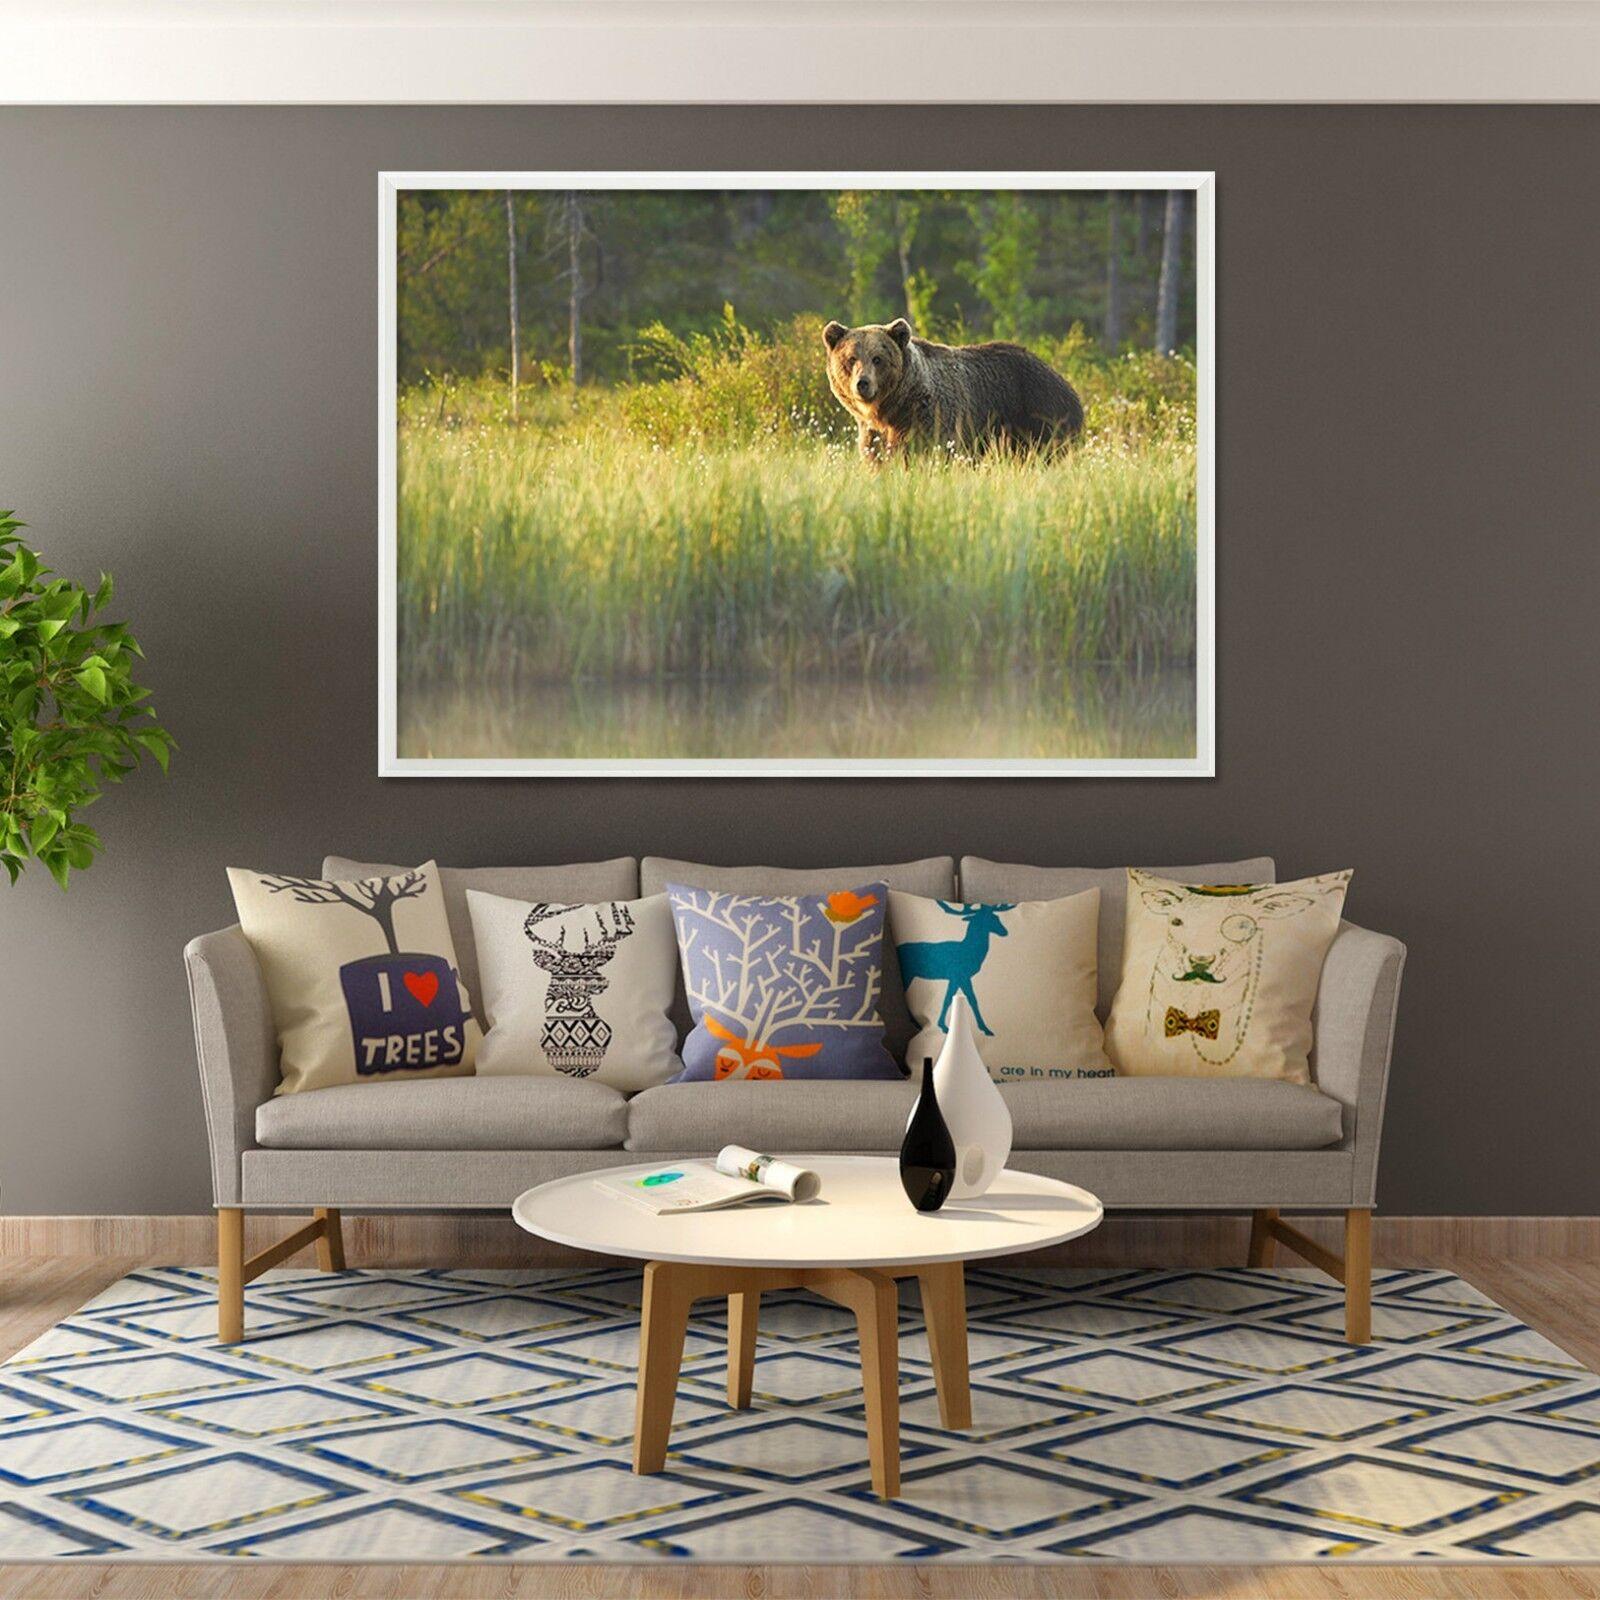 3D Grass Walking Bear 3 Framed Poster Home Decor Print Painting Art AJ WALLPAPER